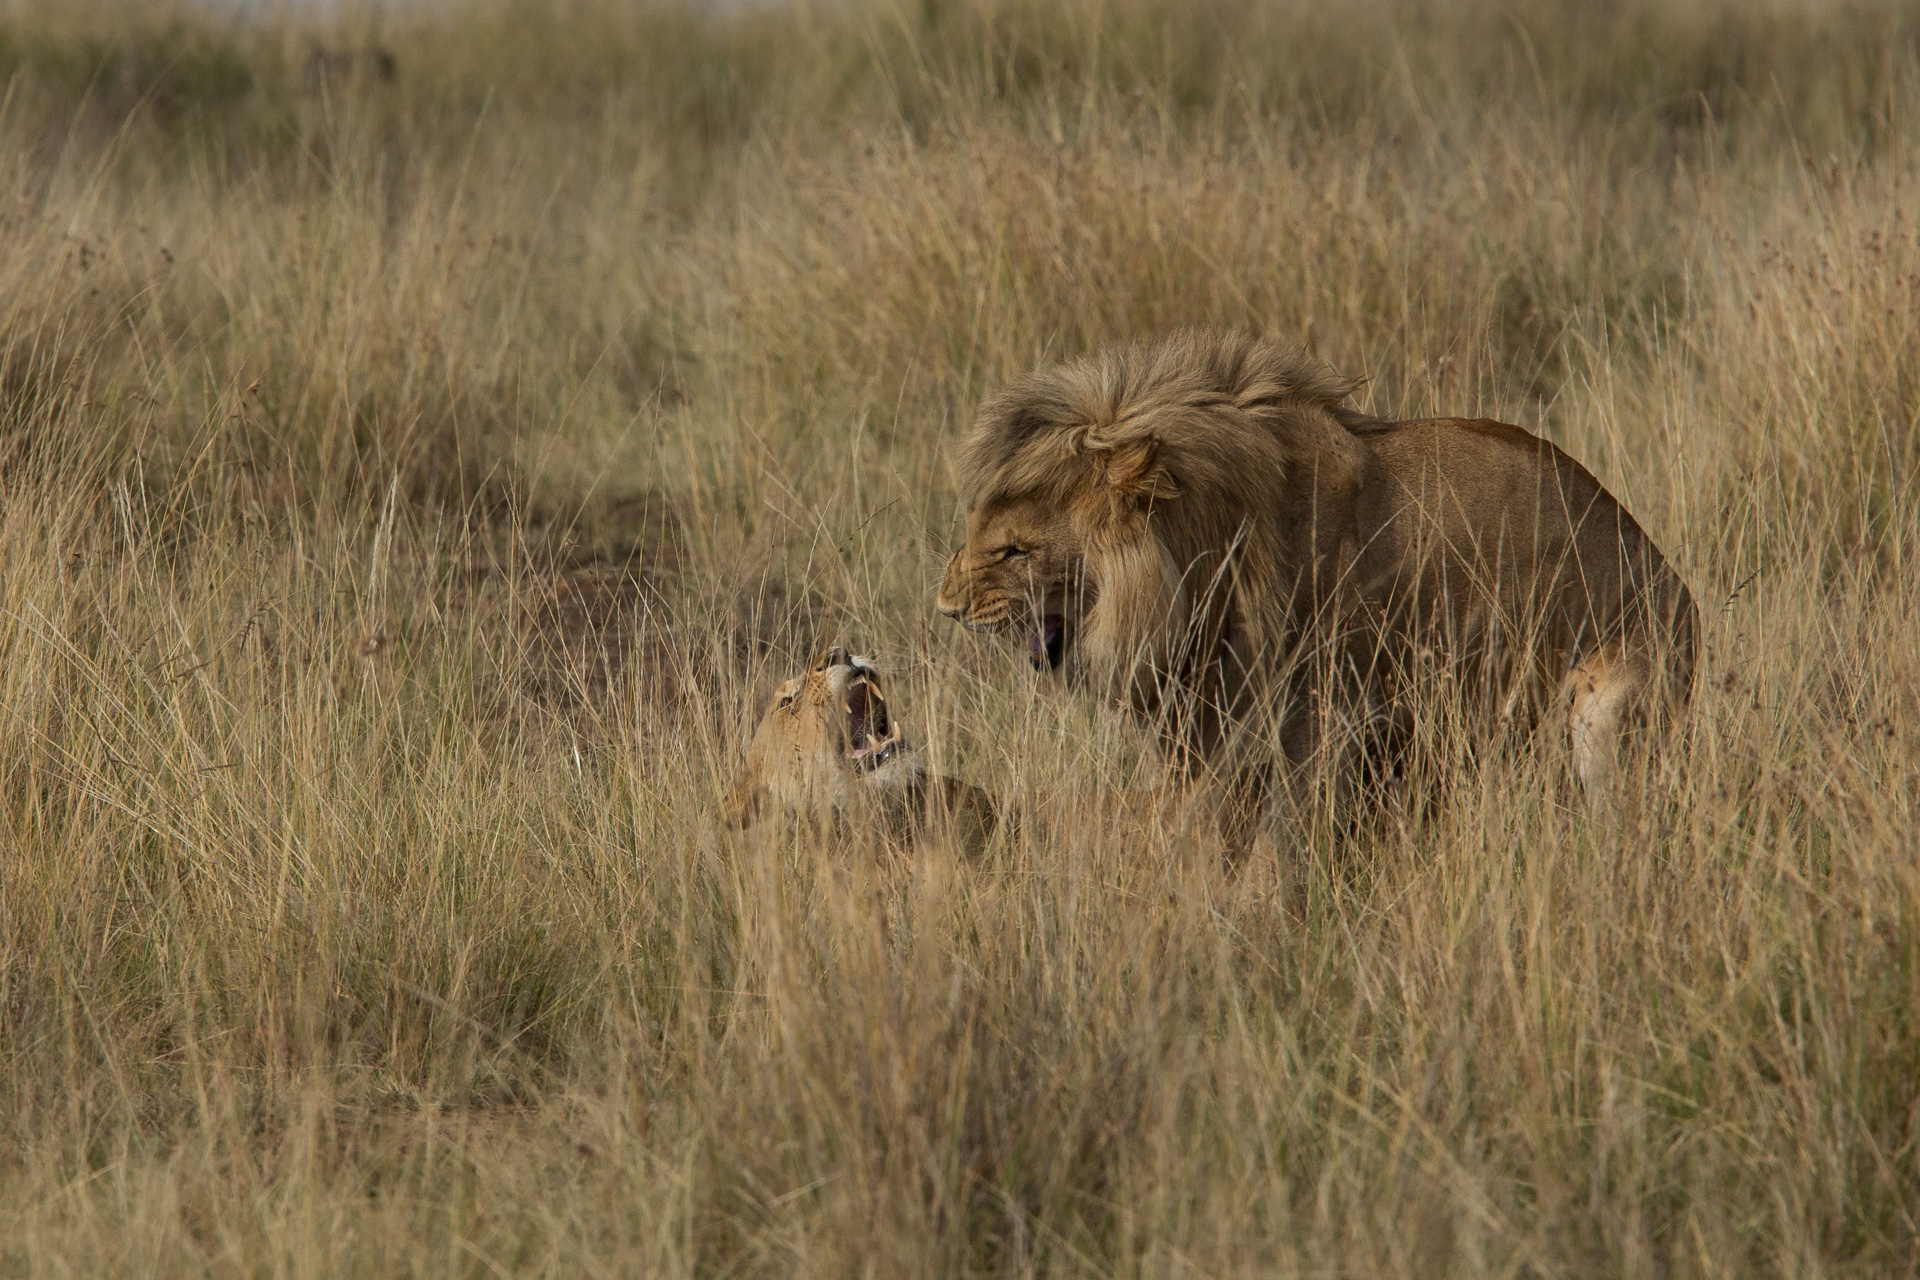 Lion Mating